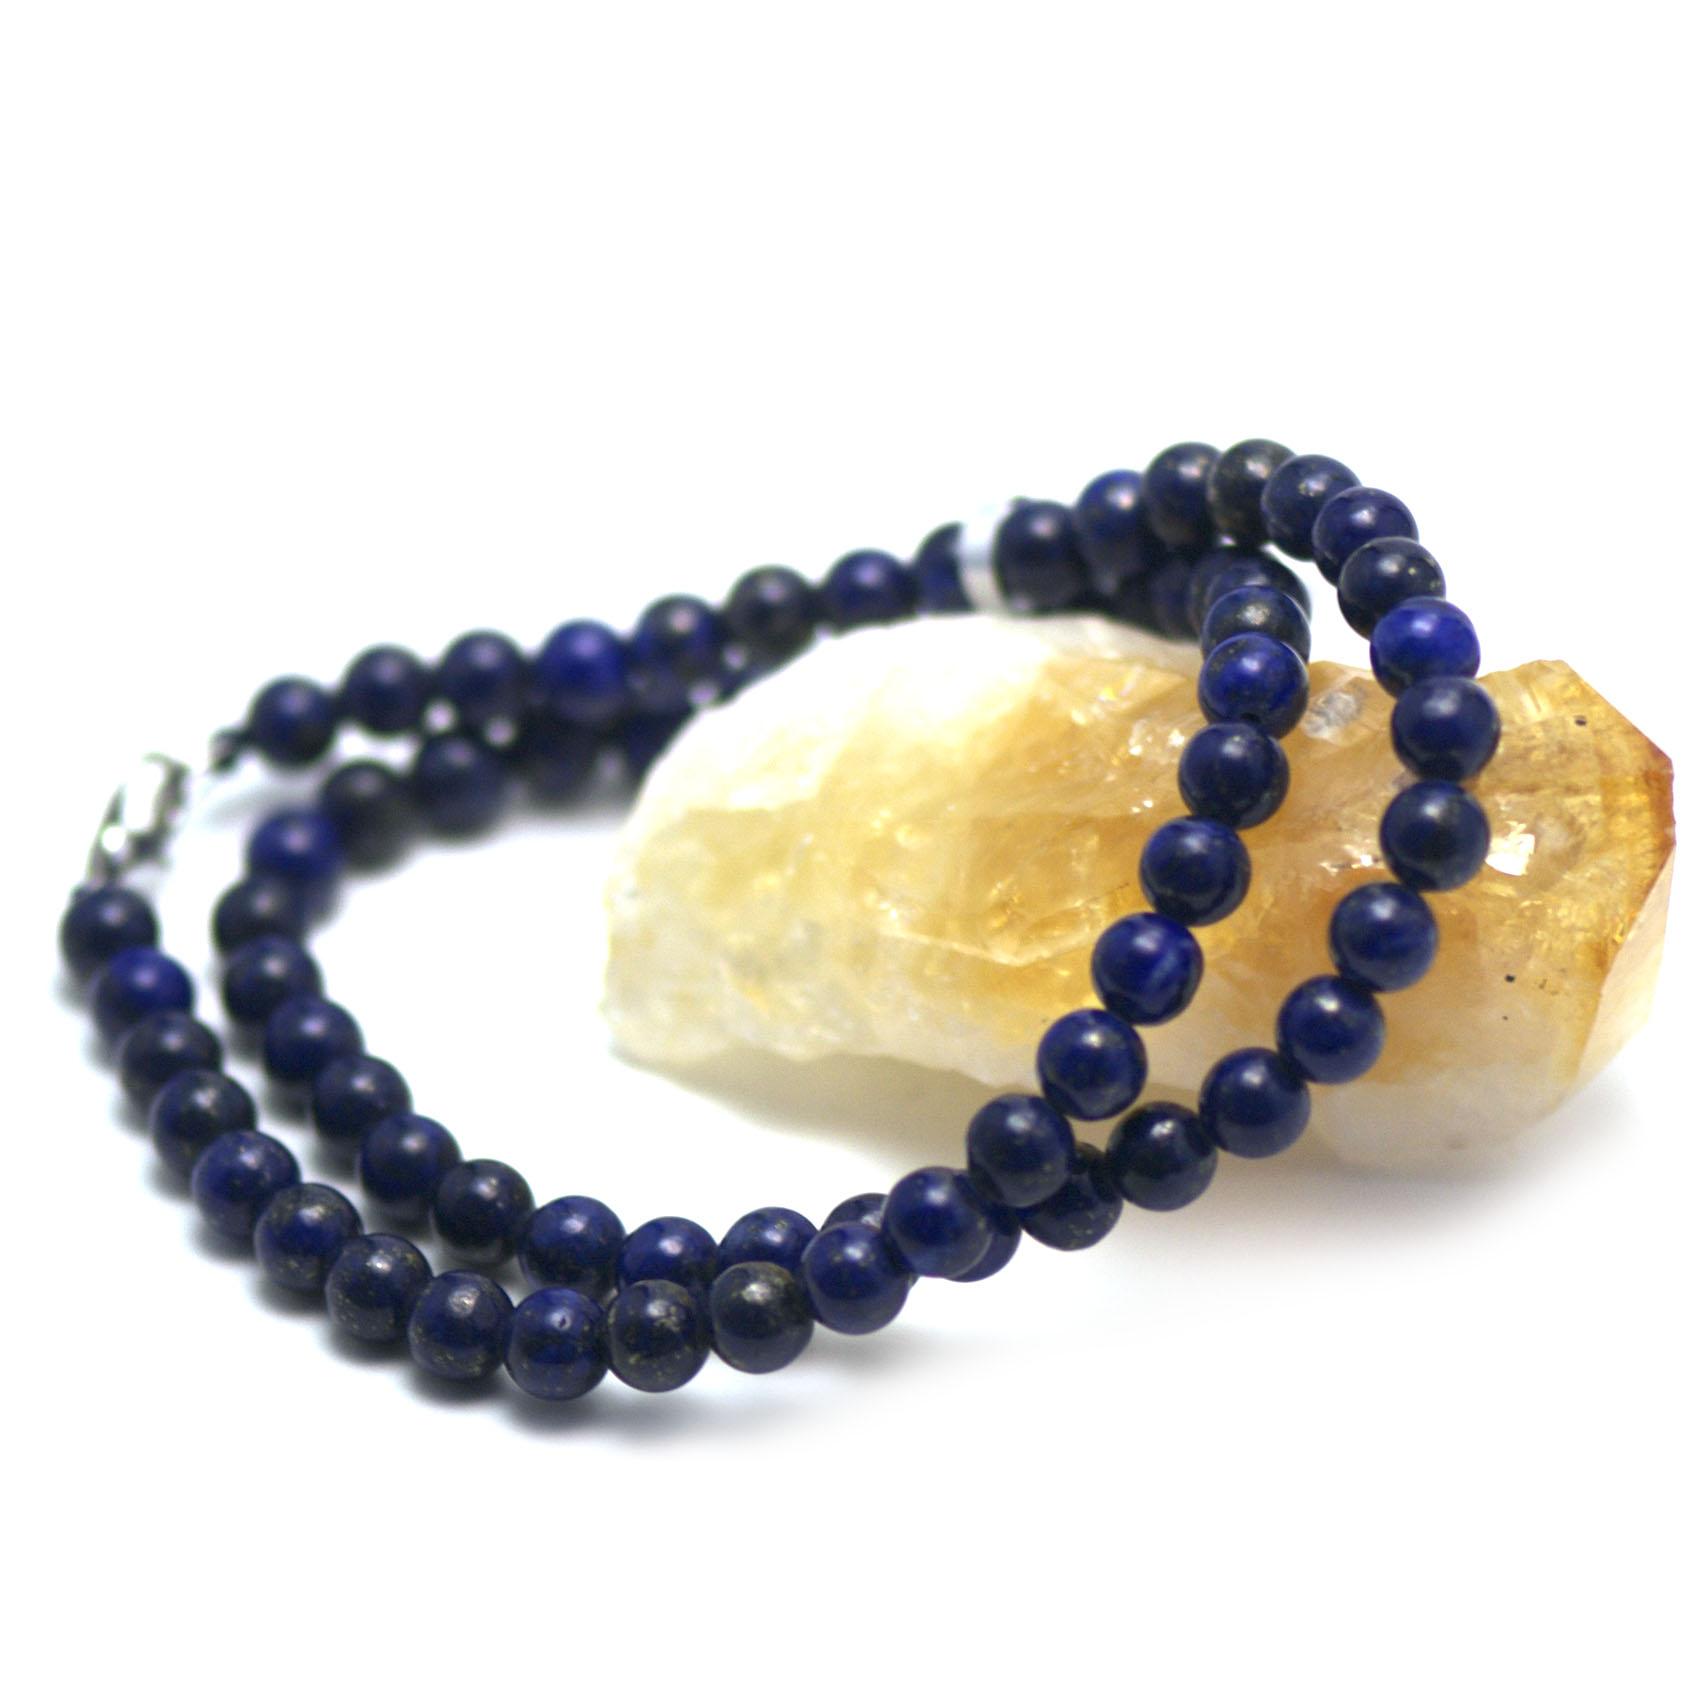 Collier lapis lazuli , perle ronde 6 mm